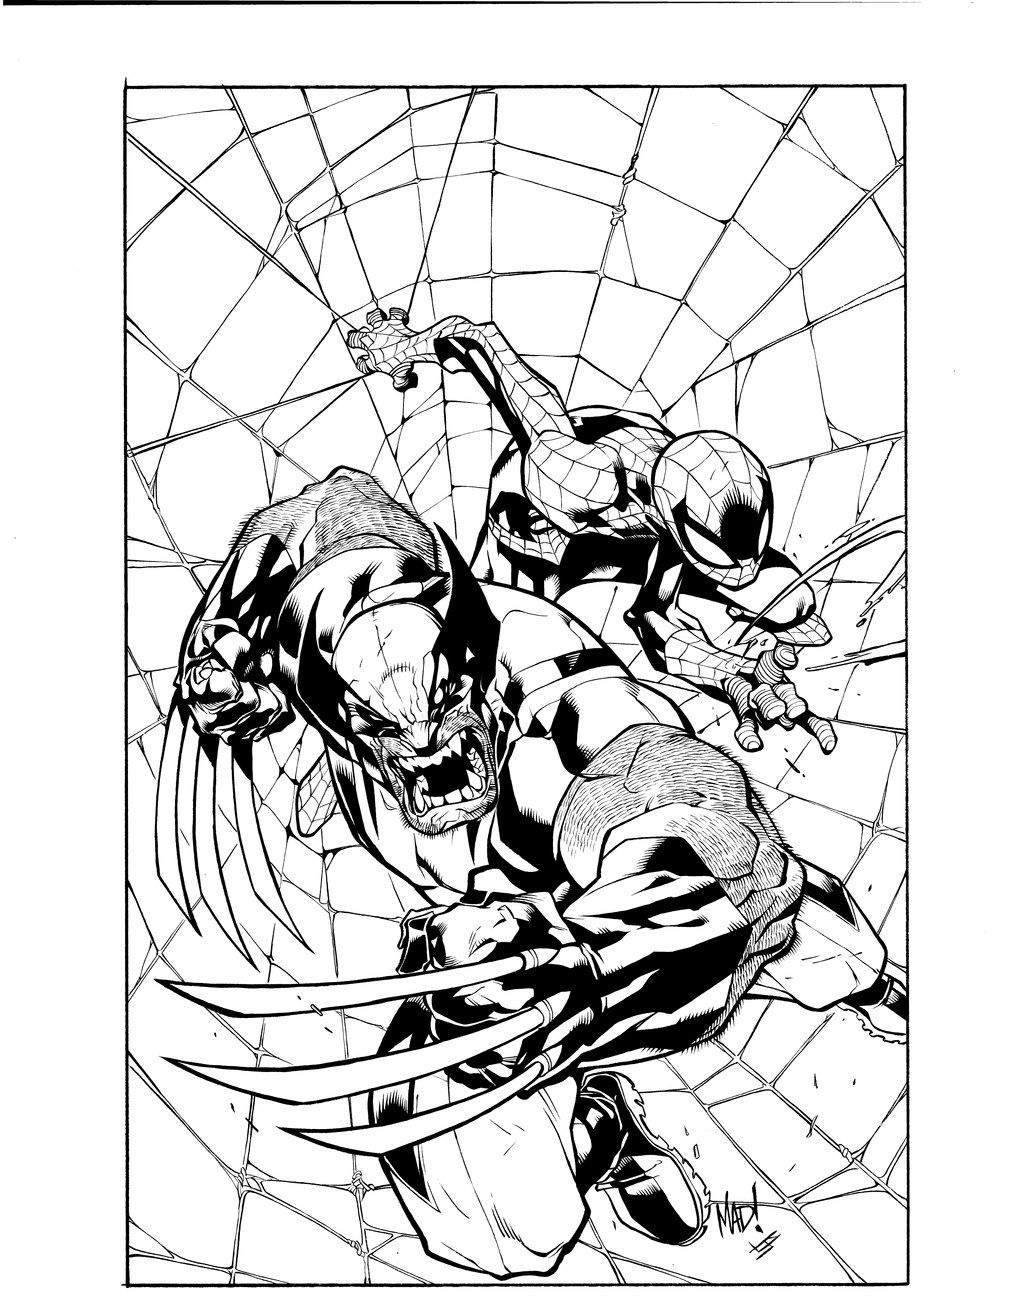 Joe Mad Wolverine Spiderman Inks By Ubermorte Deviantart Com On Deviantart Wolverine Art Inks